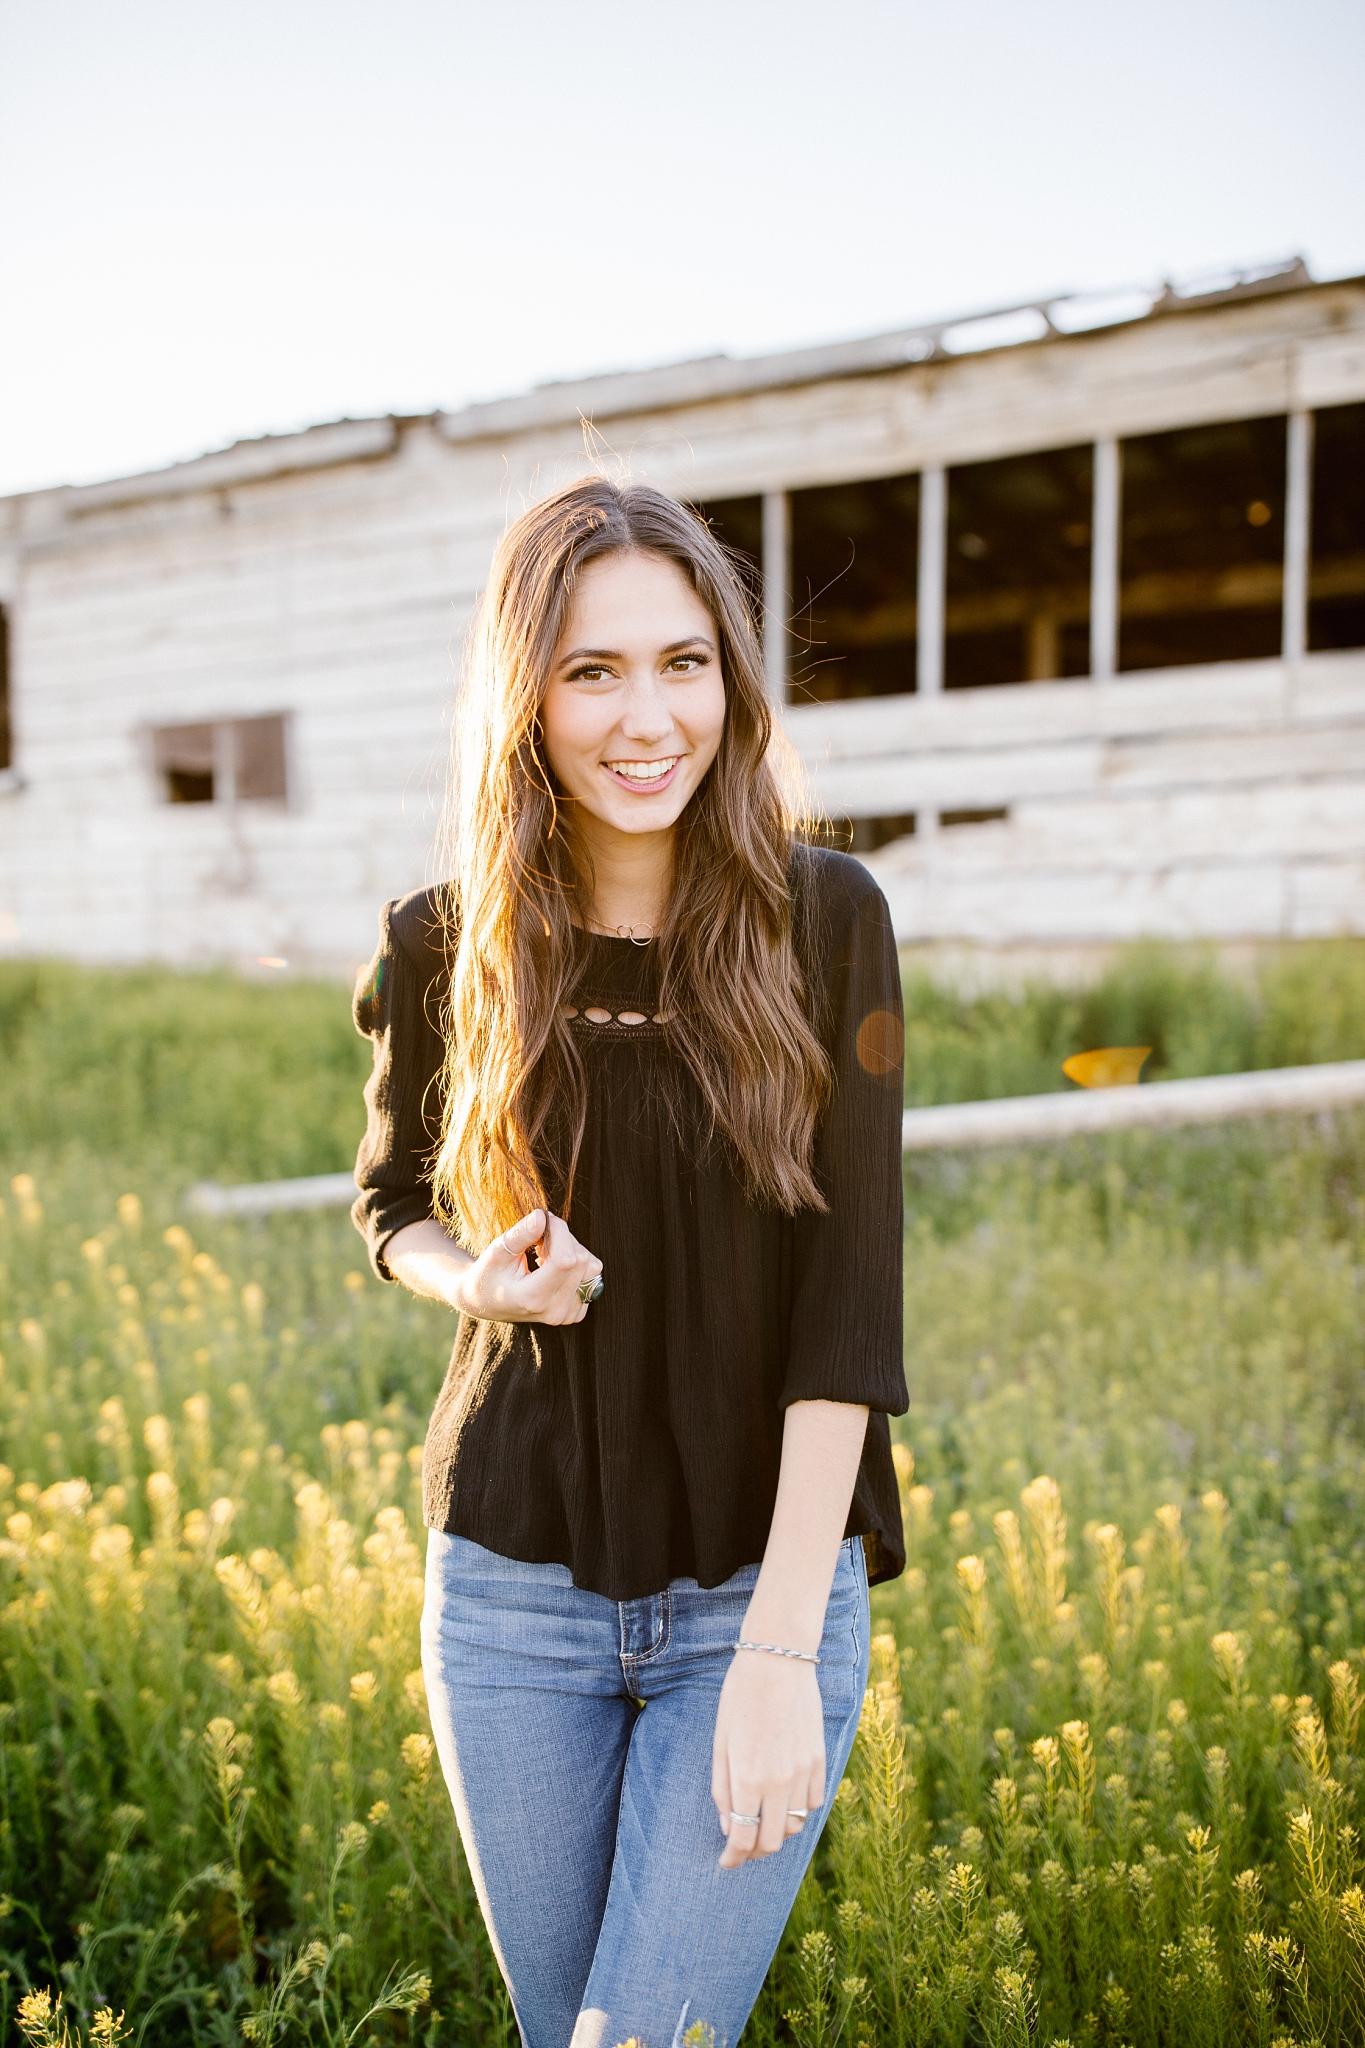 Audrey-149_Lizzie-B-Imagery-Utah-Family-Photographer-Central-Utah-Senior-Photography.jpg